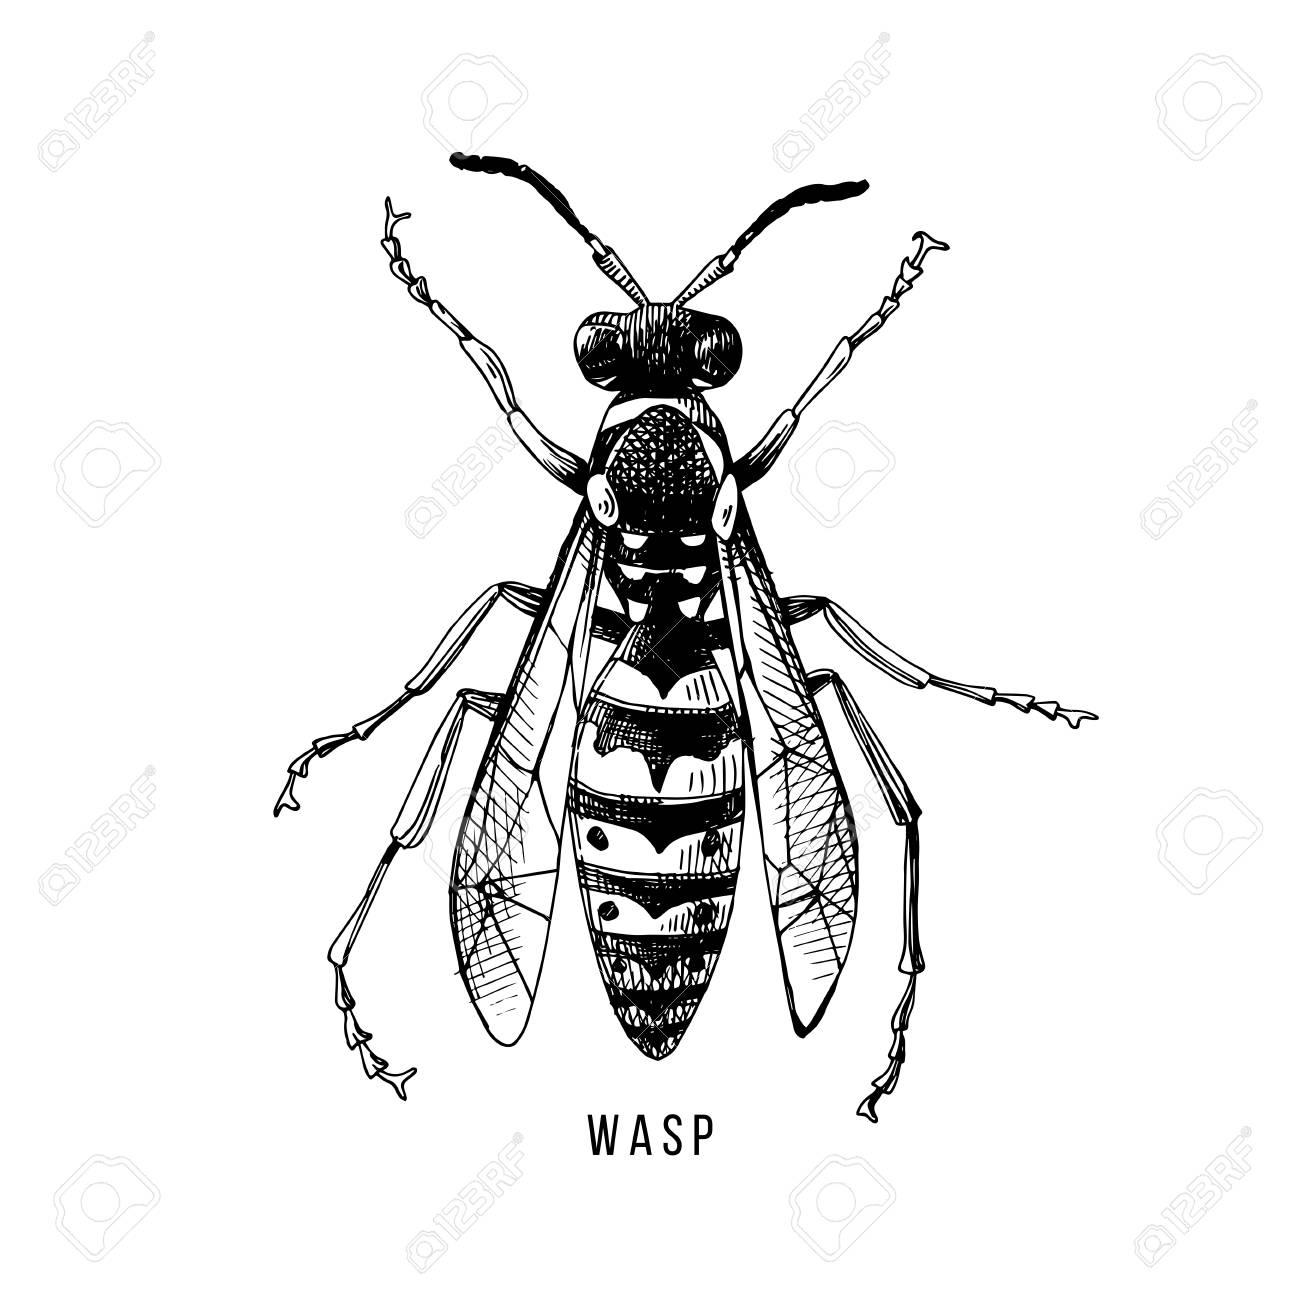 Hand drawn wasp illustration - 117674709